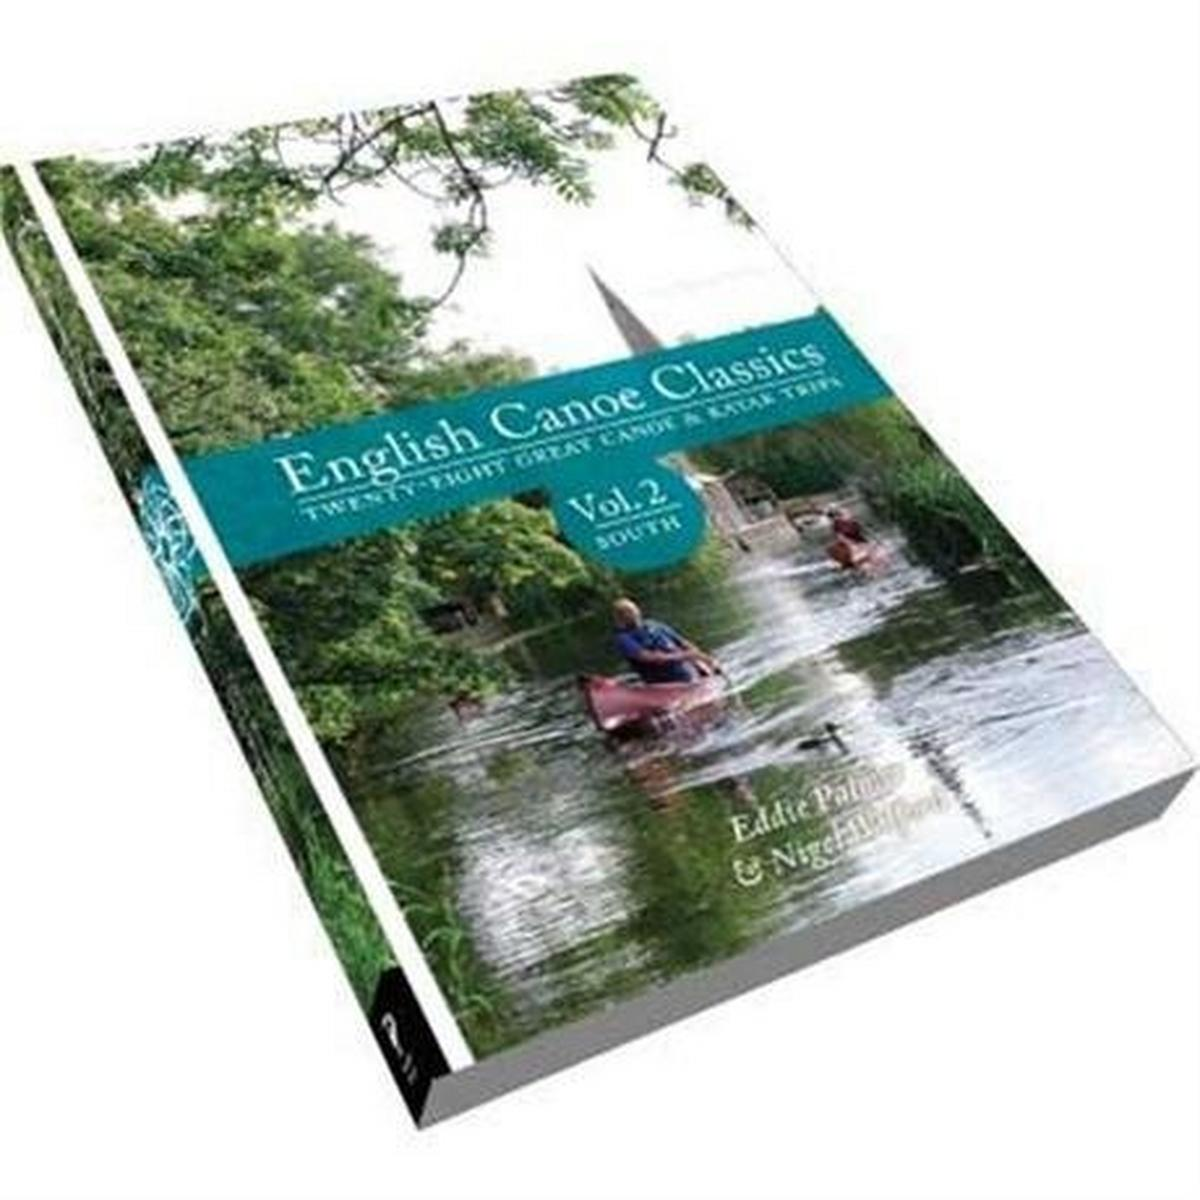 Pesda Press Guide Book: English Canoe Classics: Volume 2 South